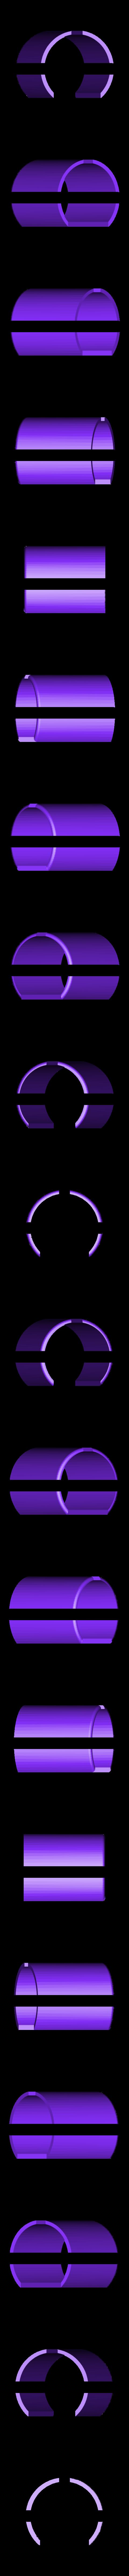 DualBottomOuter.STL Download free STL file LIGHTSABER - LED - Fully Functional • 3D printer template, Balkhagal4D